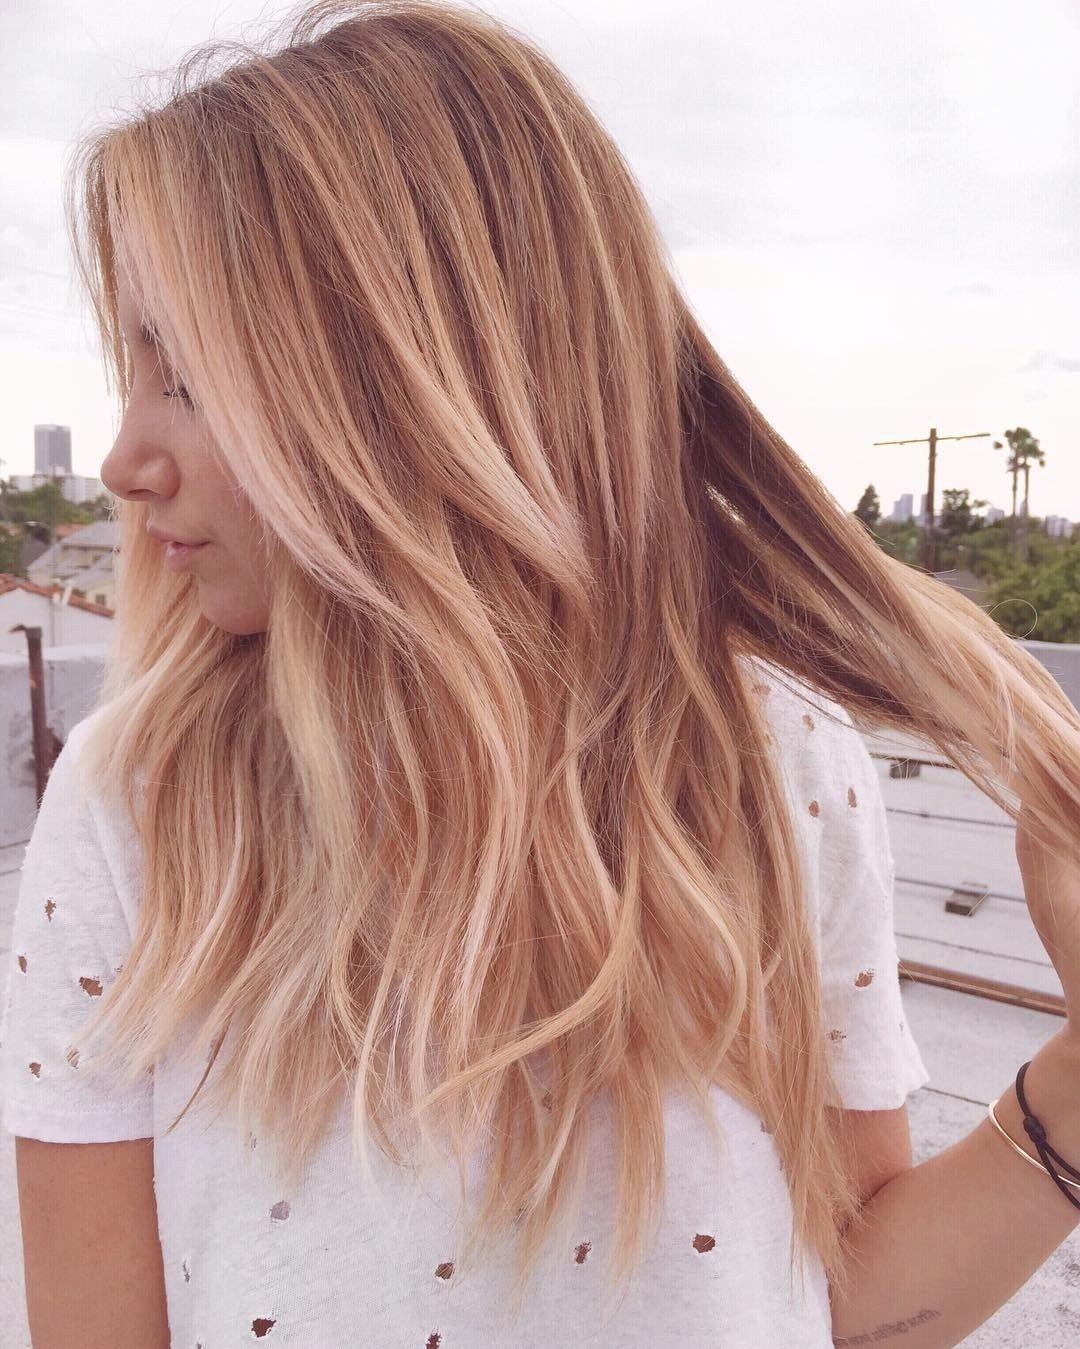 Pink Blonde Hair Color Hair Pinterest Cabelo Cabelo Bonito E